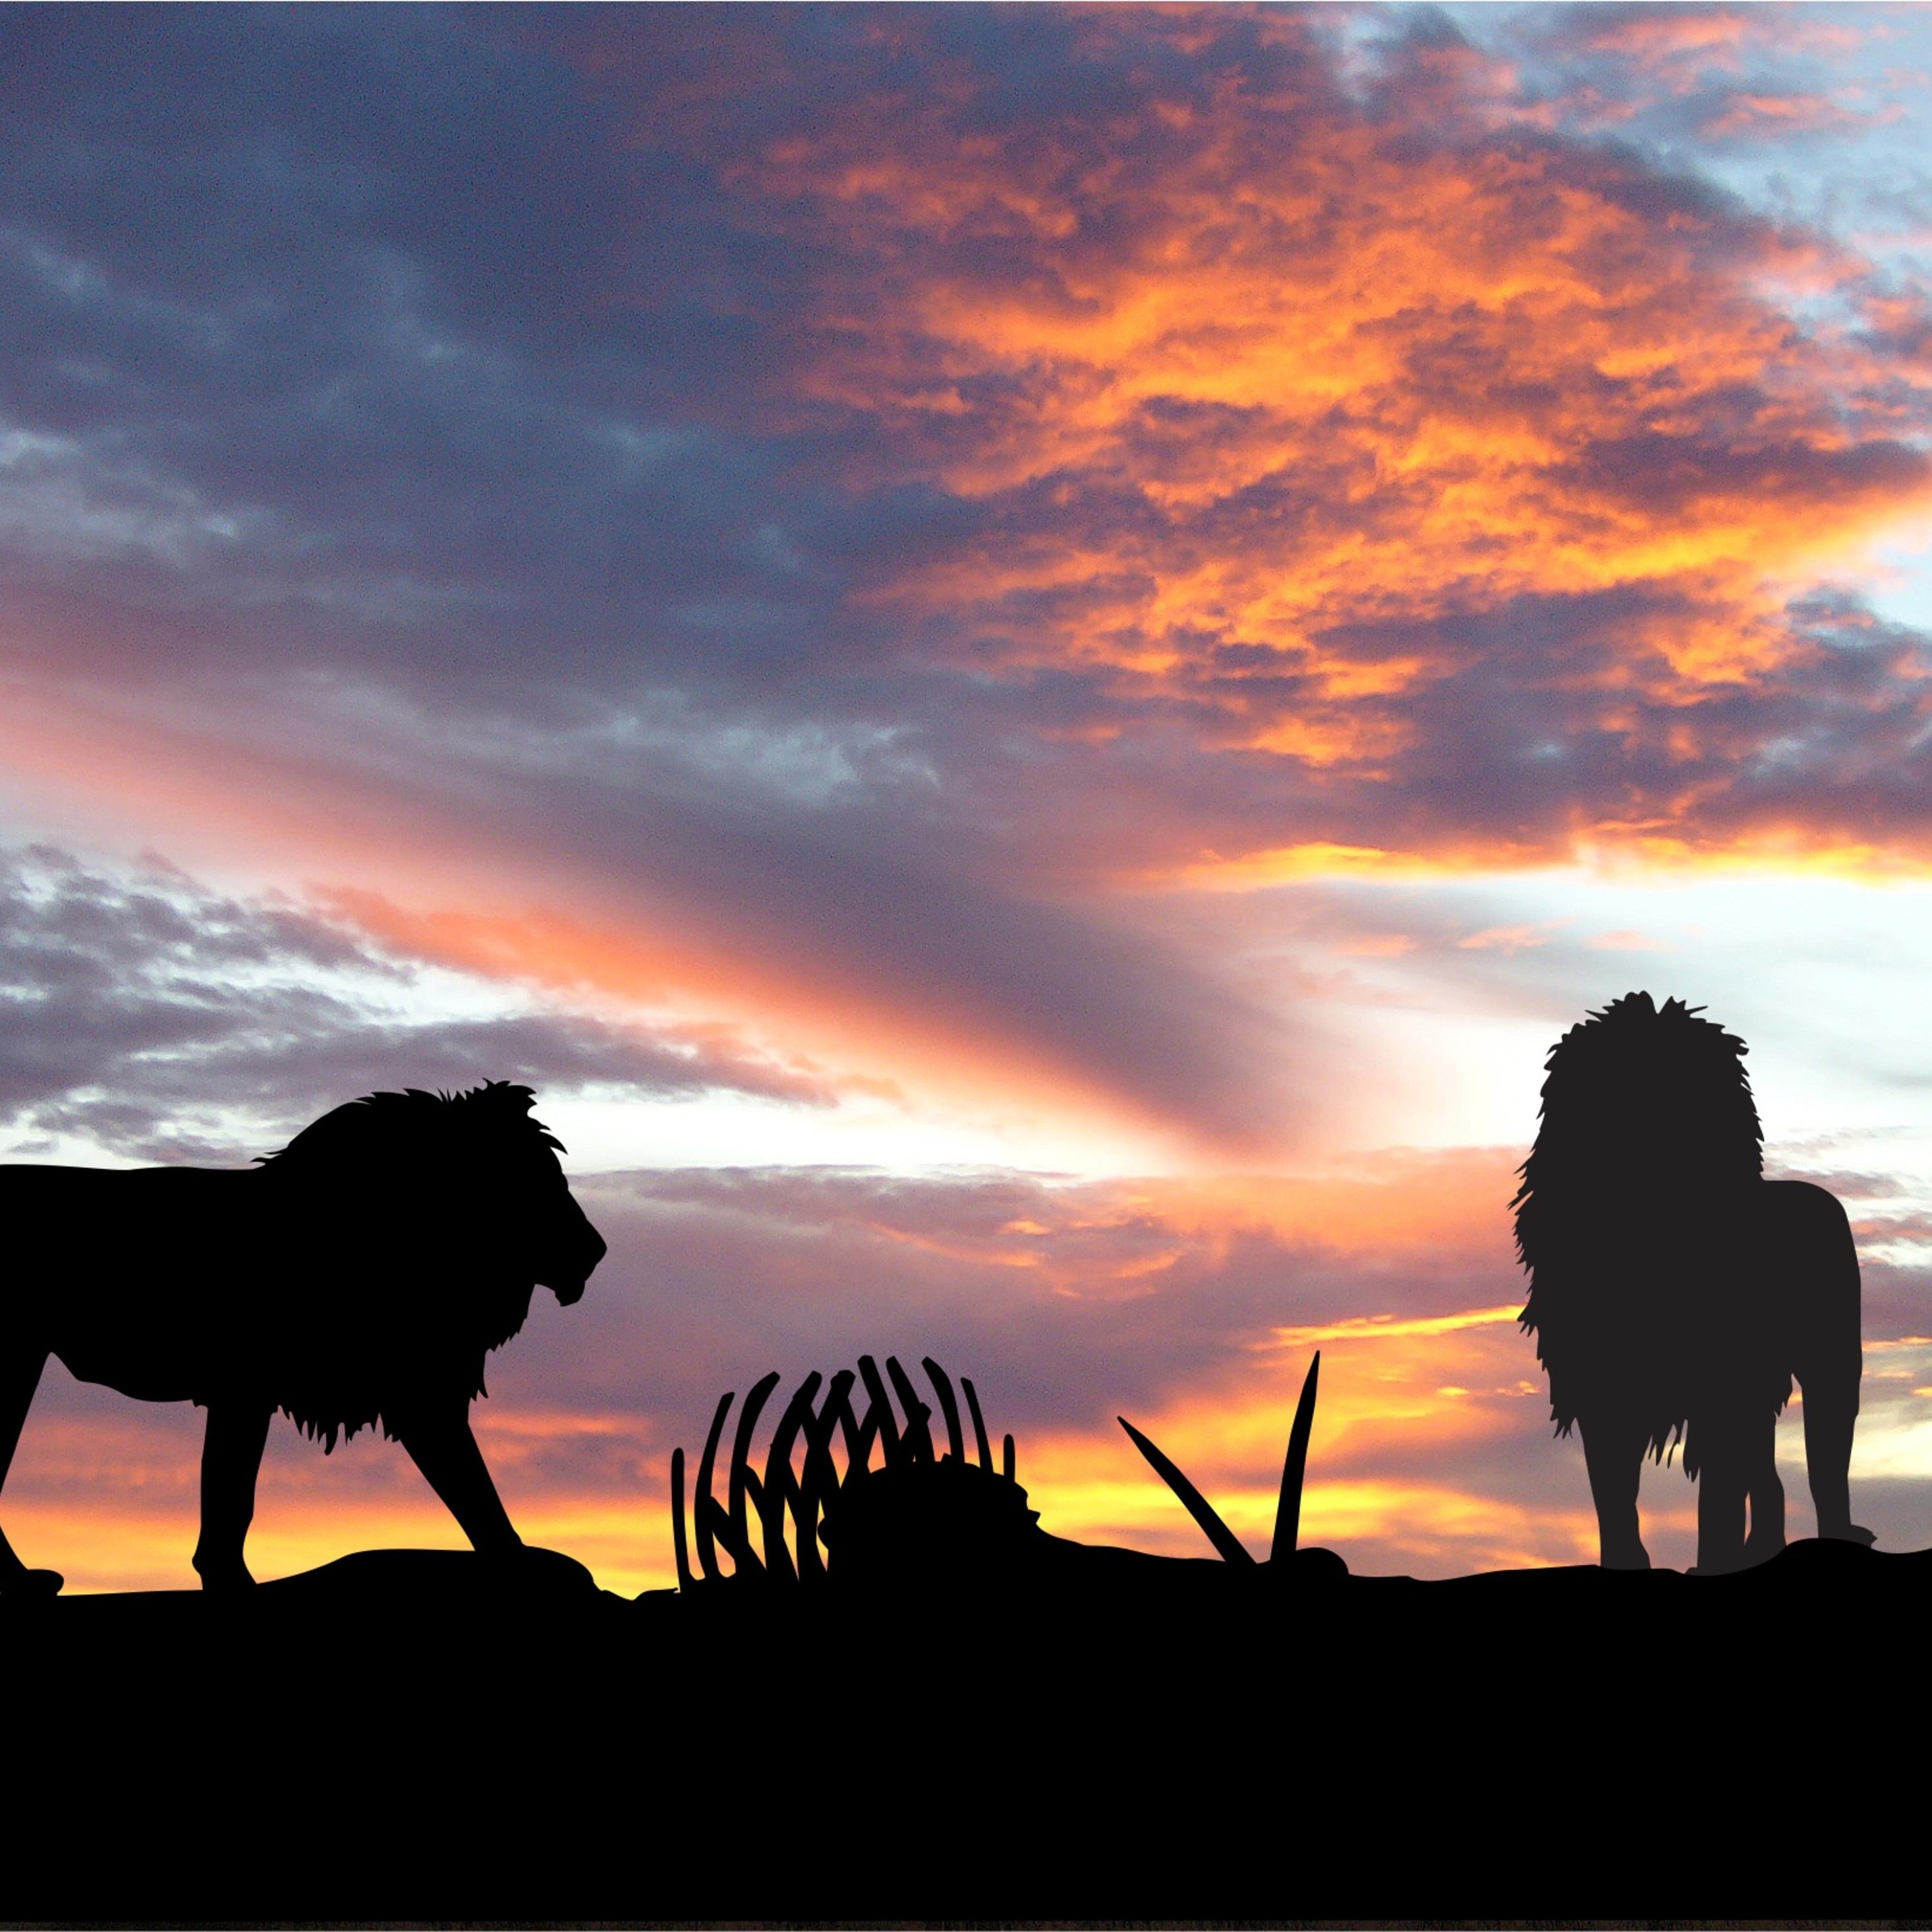 lions-africa-silhouette-sunset-od.jpg